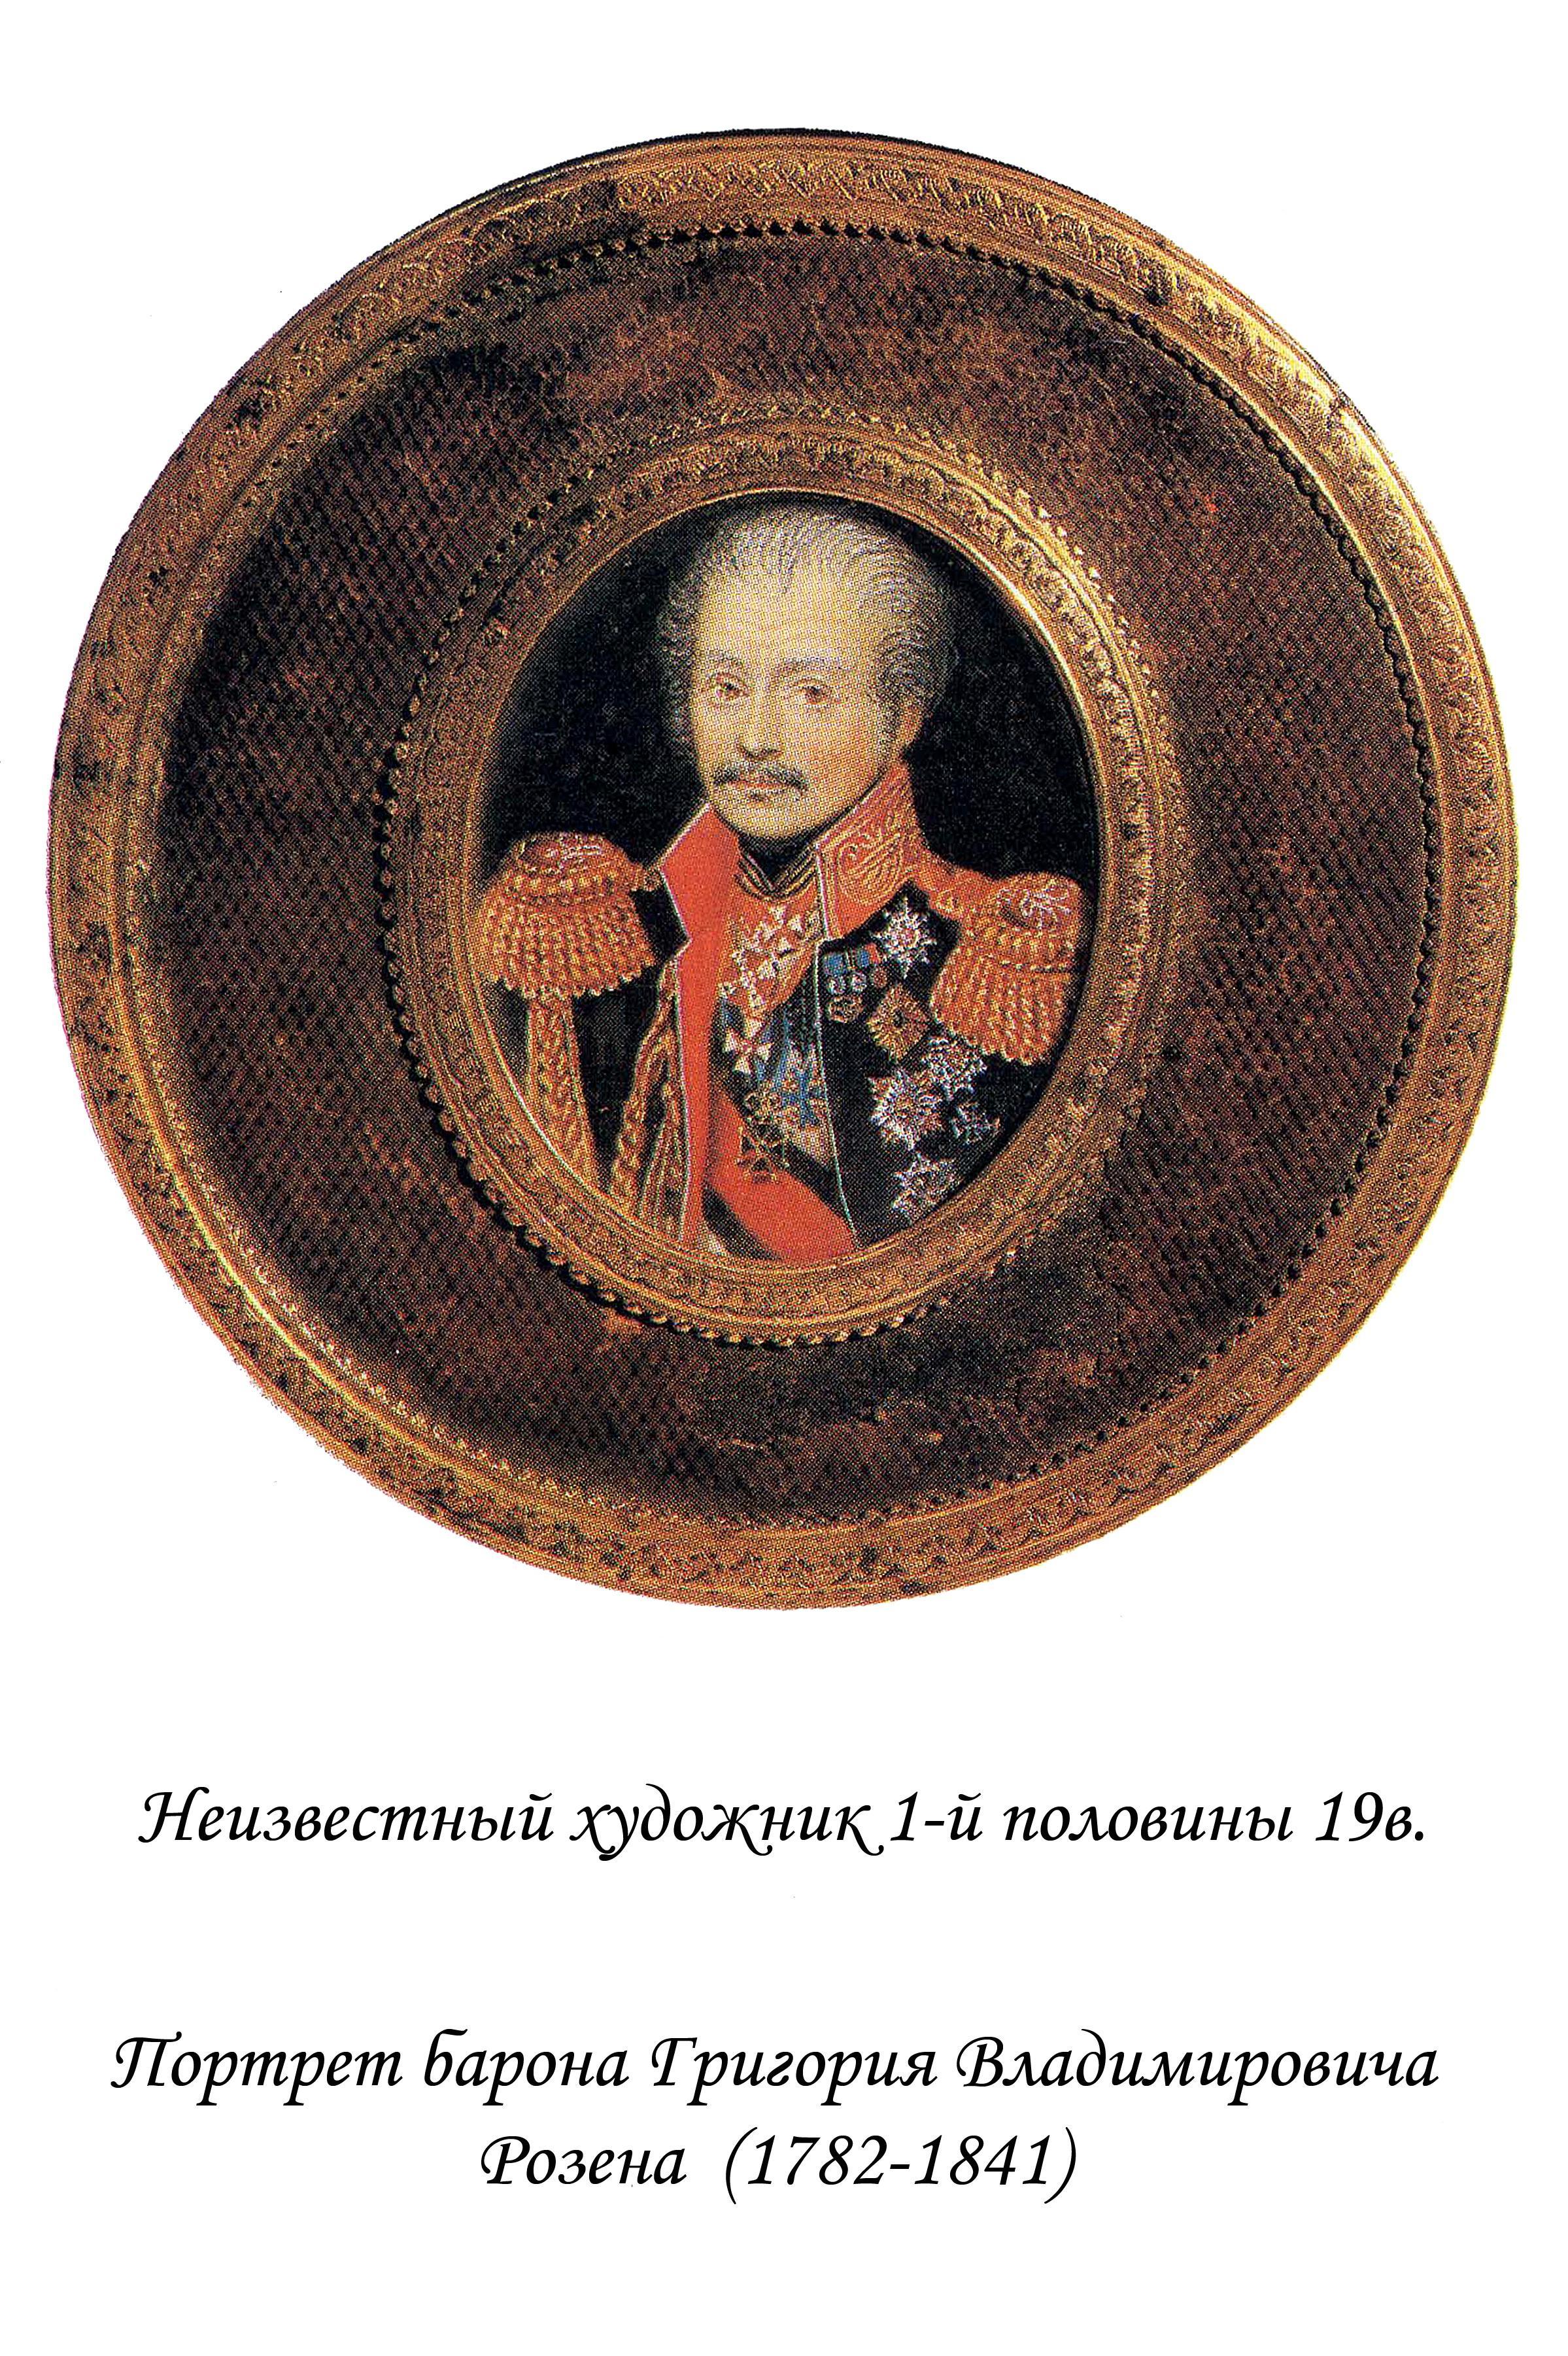 http://molitva-ivanovo.narod.ru/pages/pages68big.jpg